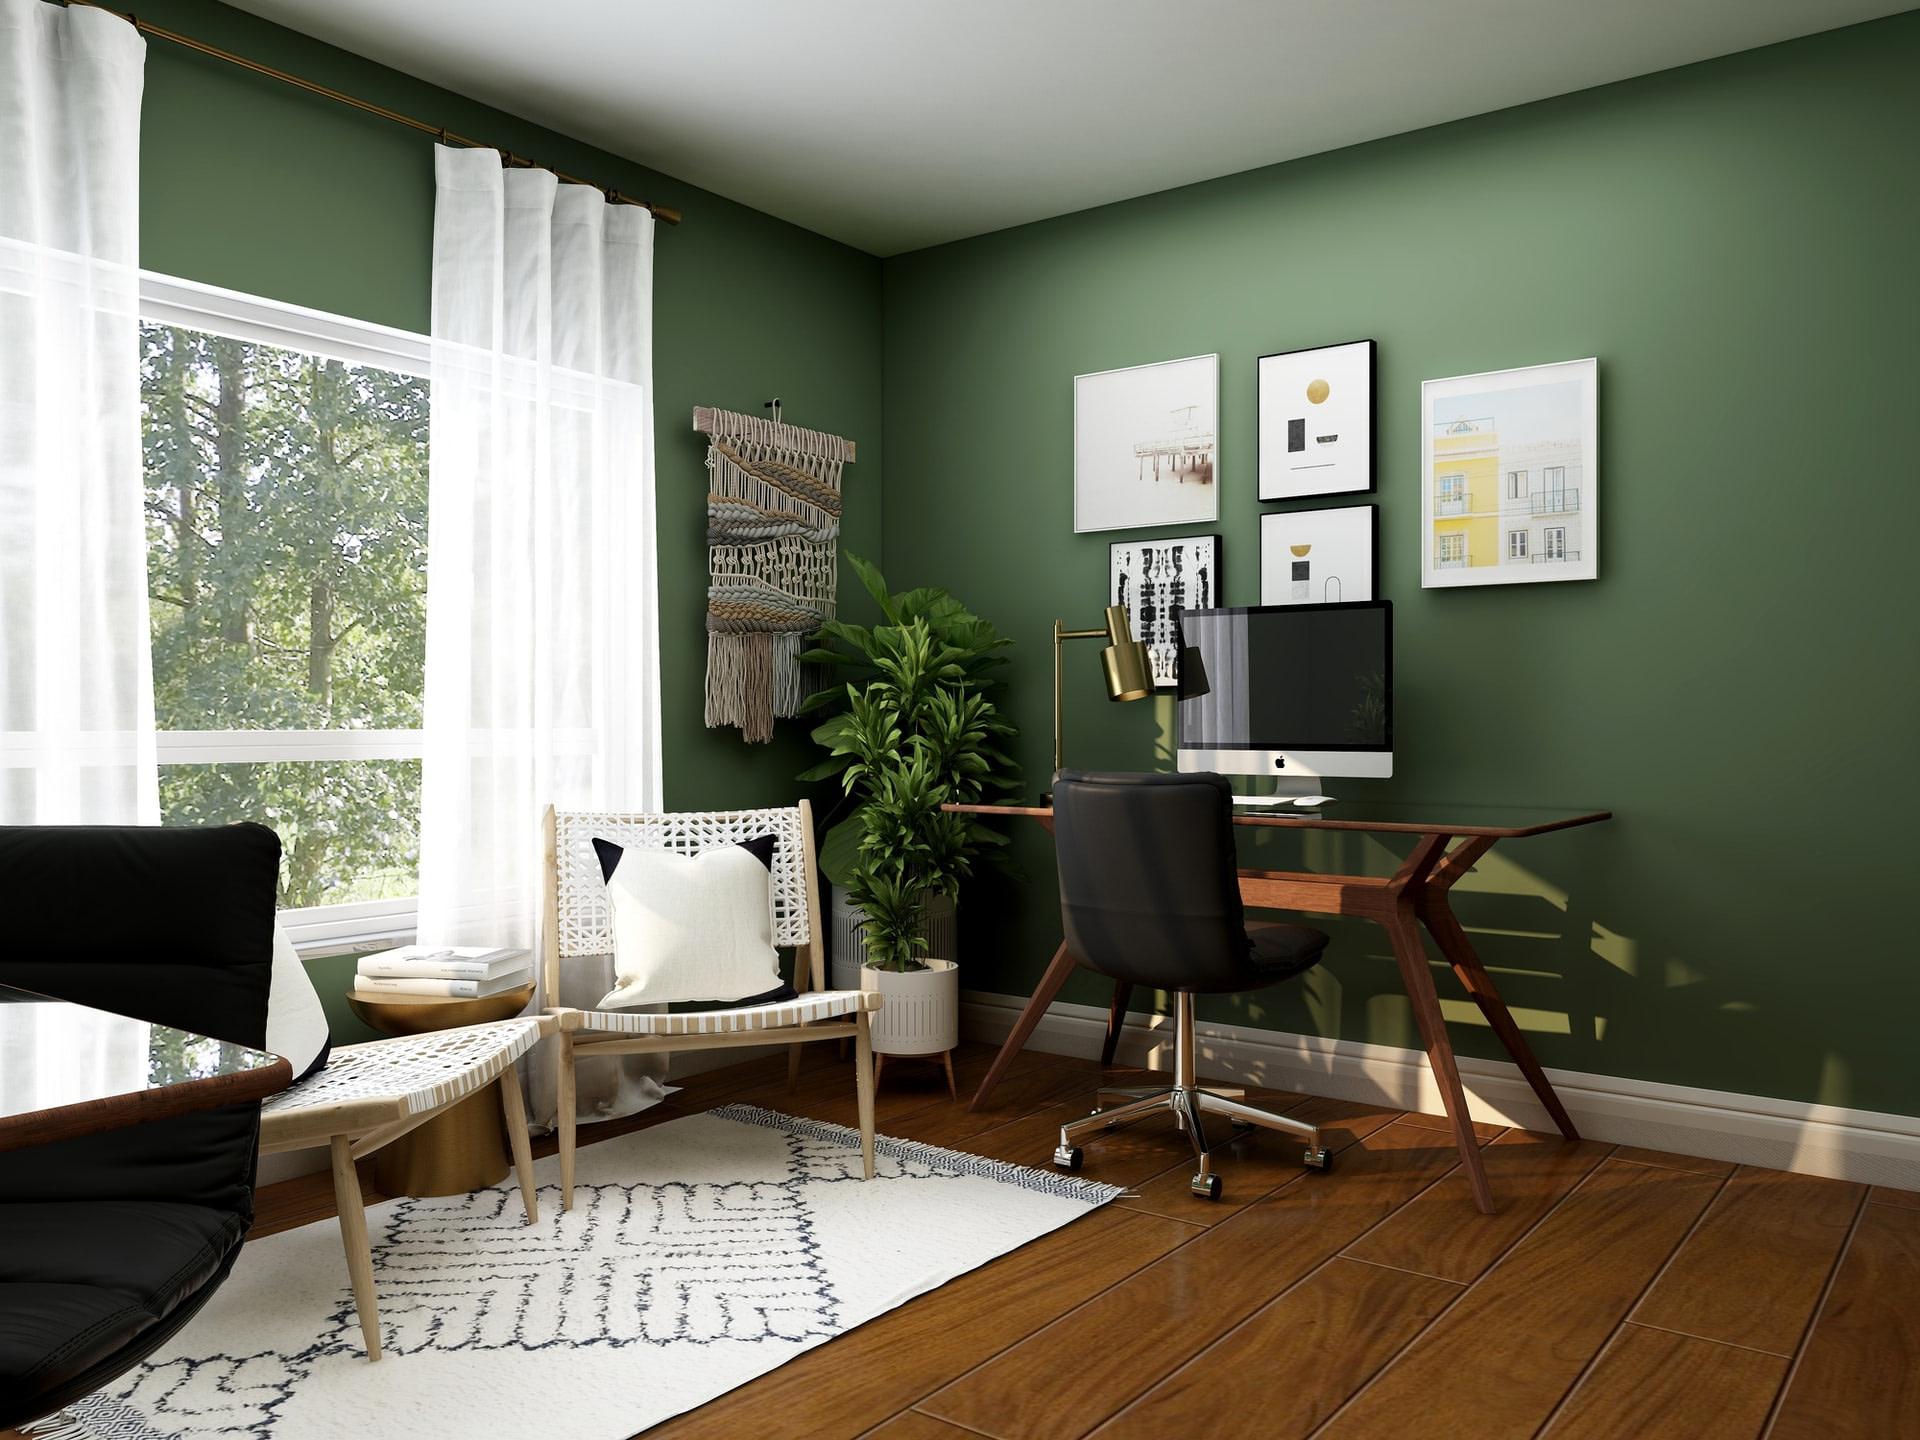 collov-home-design-UUsQk_9bdR8-unsplash